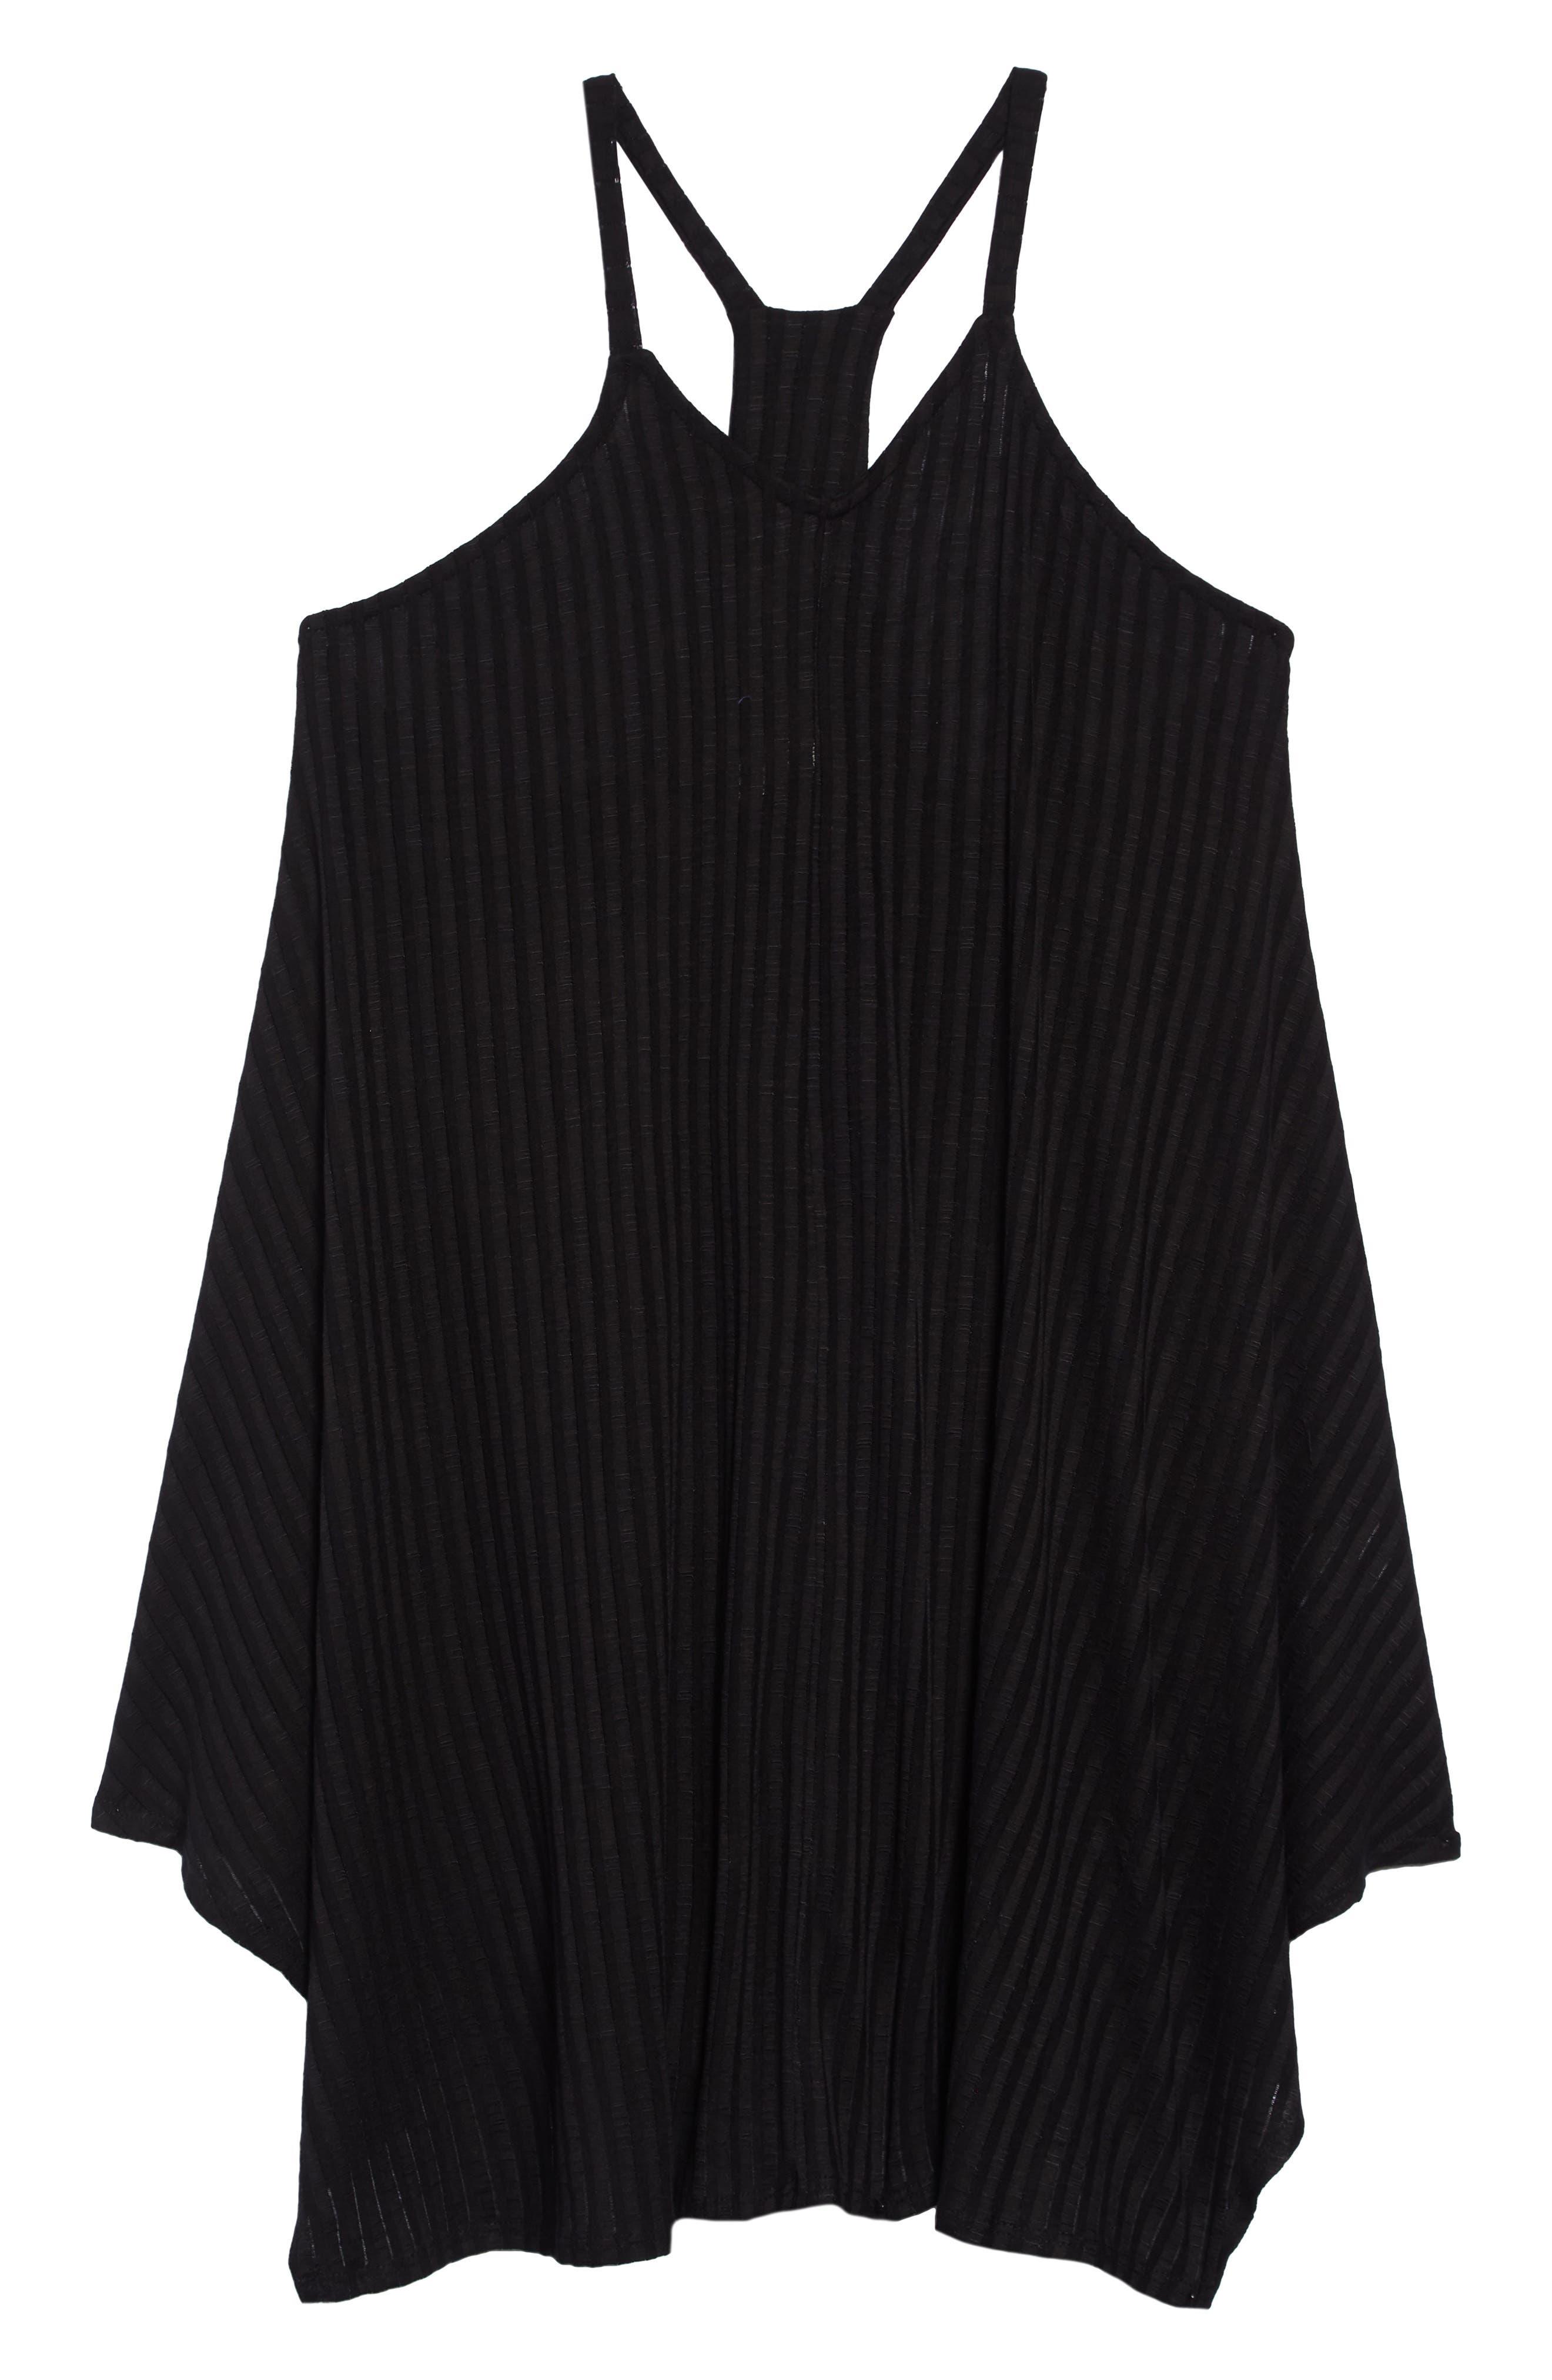 BILLABONG Twist View Cover-Up Dress, Main, color, BLACK